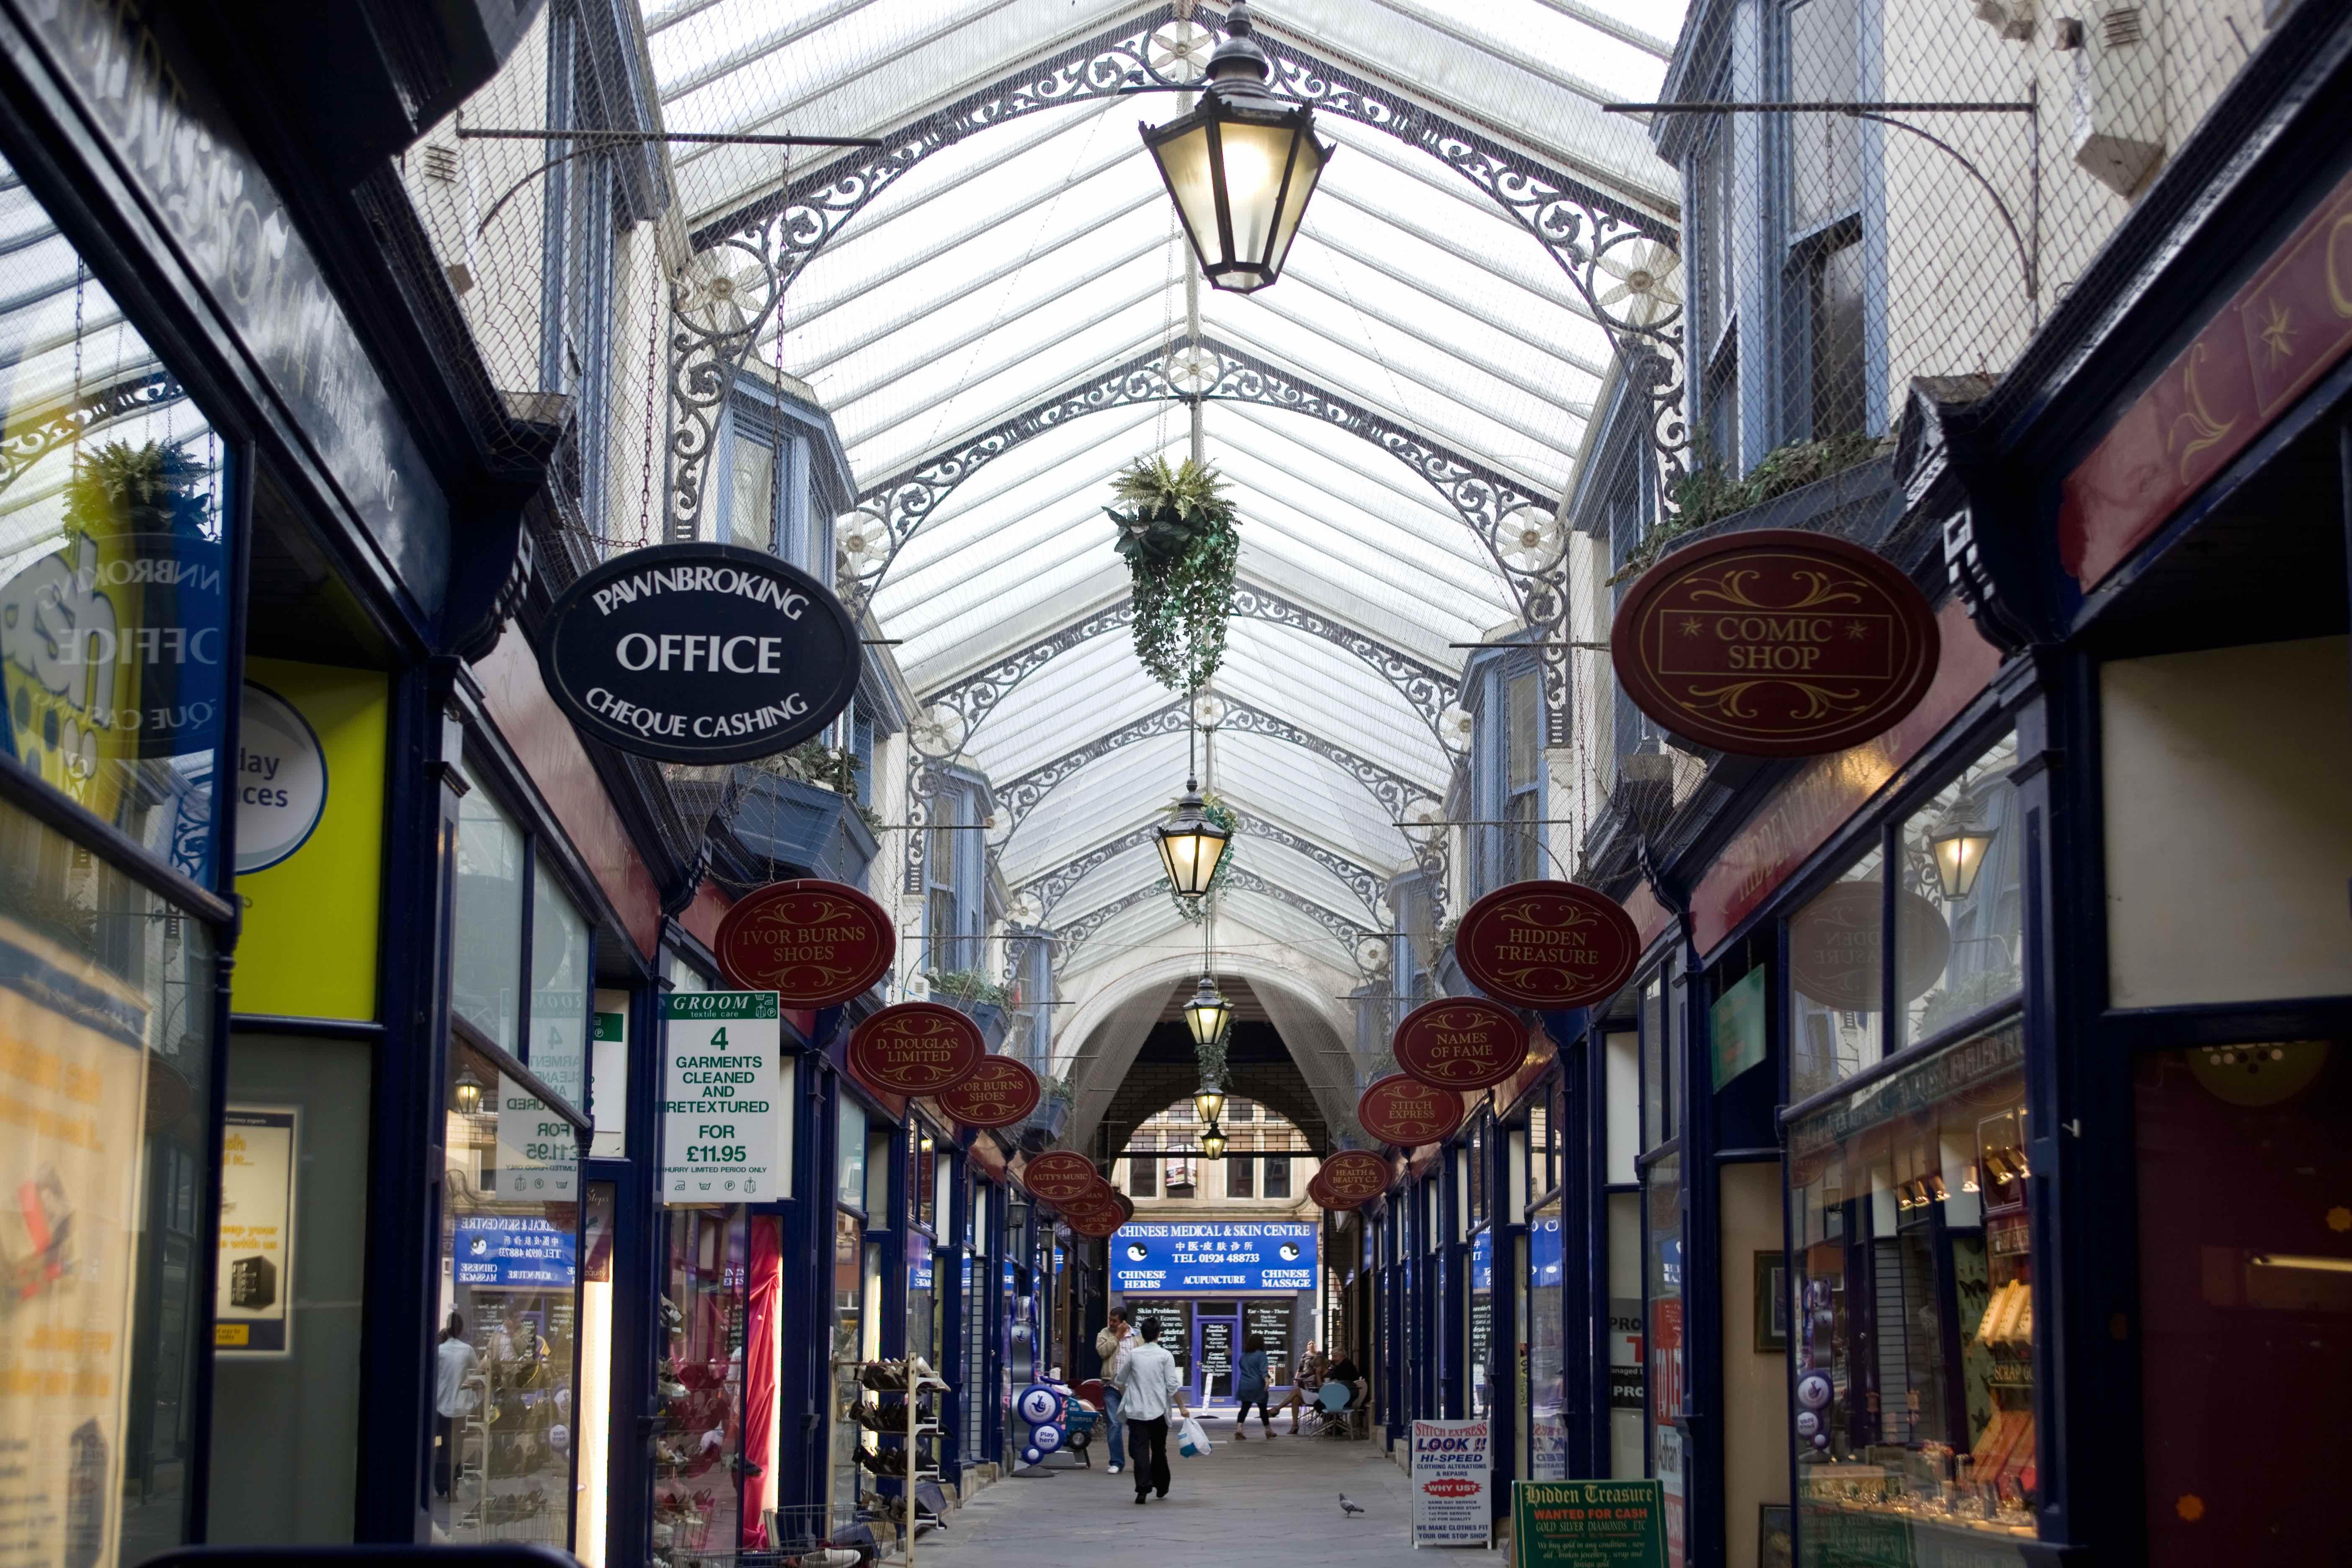 Dewsbury Arcade 2010